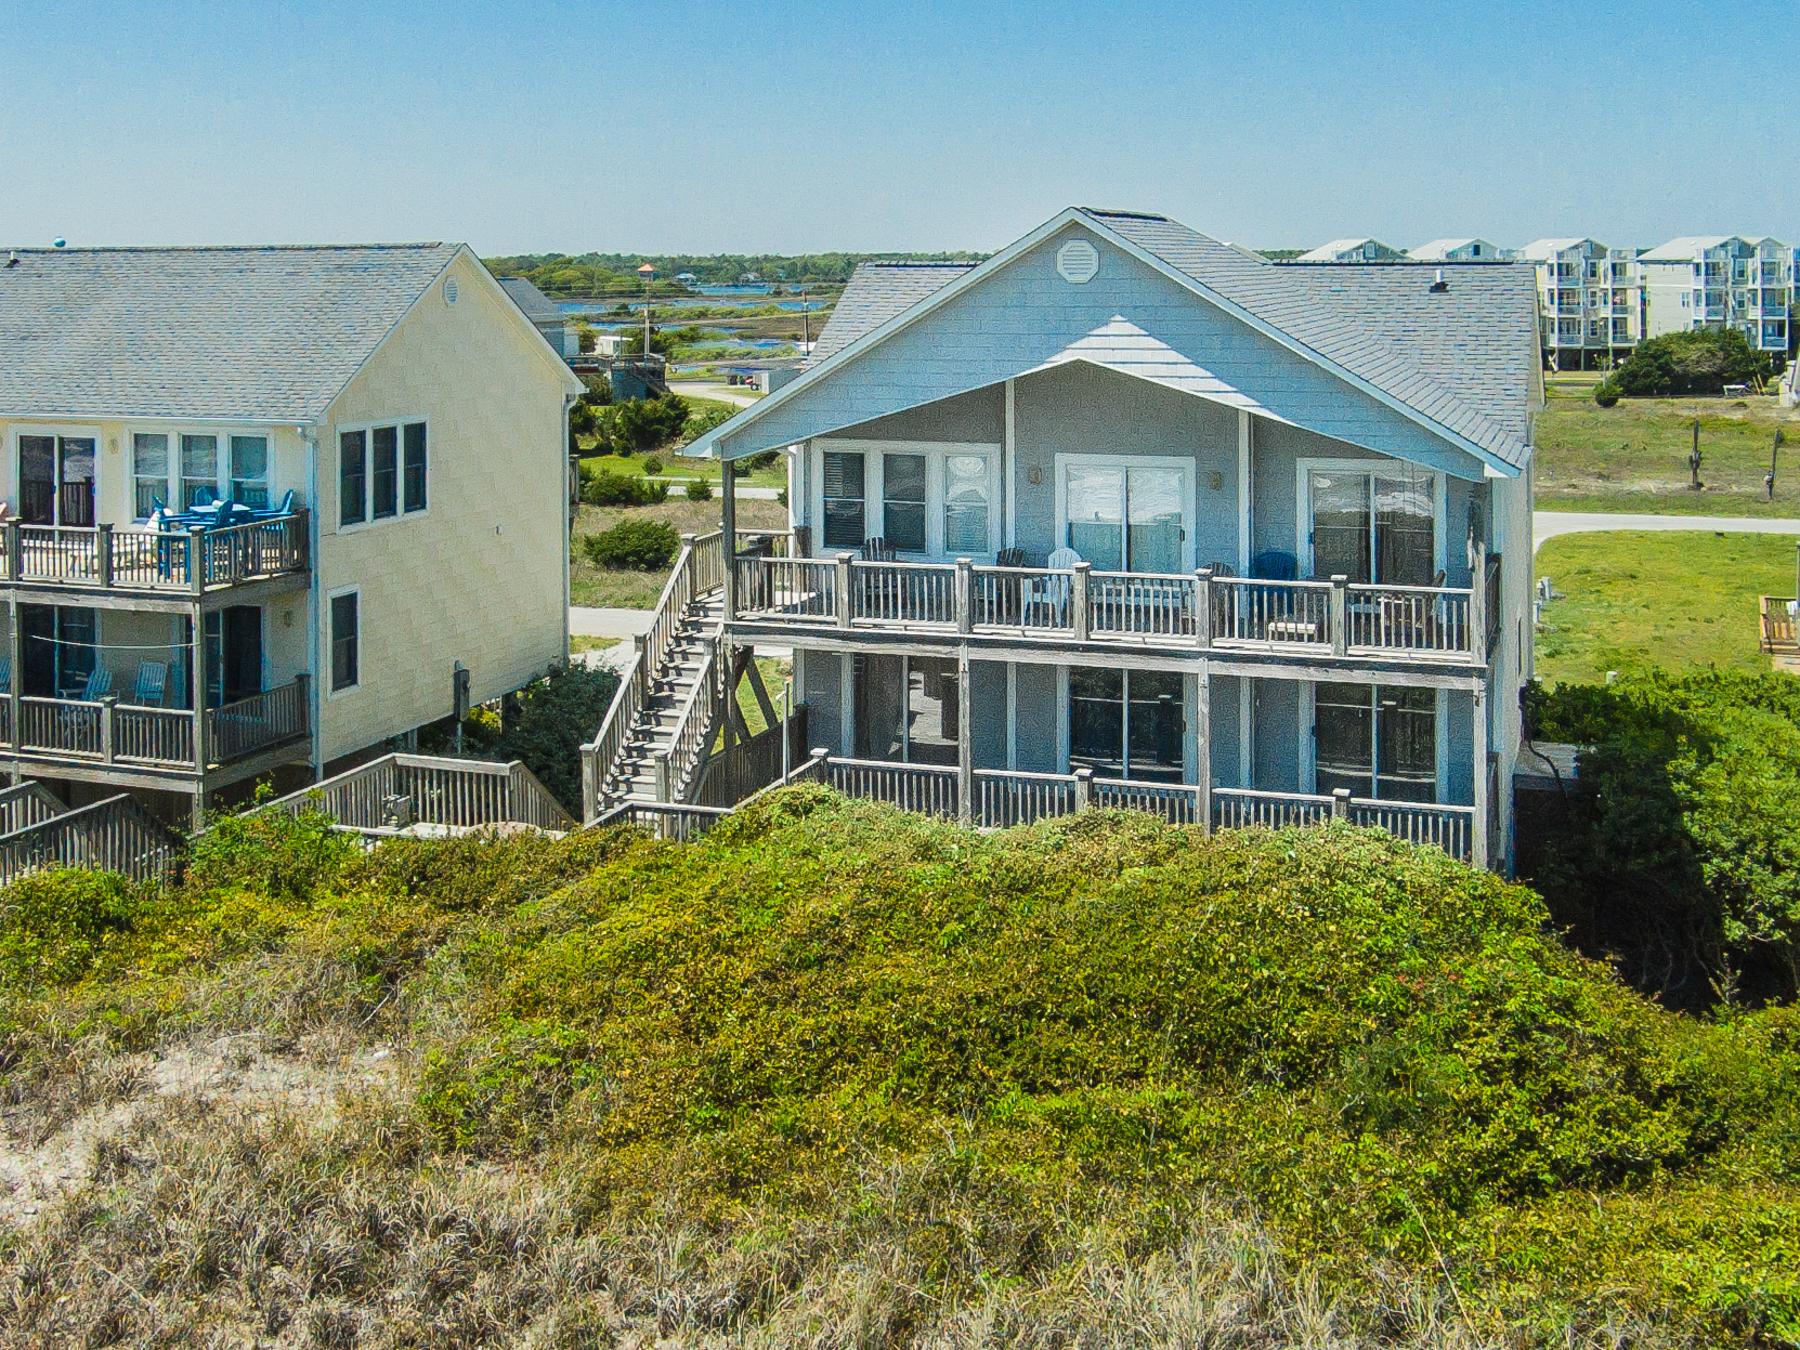 獨棟家庭住宅 為 出售 在 Oceanfront Charm 728 Sunrise Court Surf City, 北卡羅來納州 28445 美國